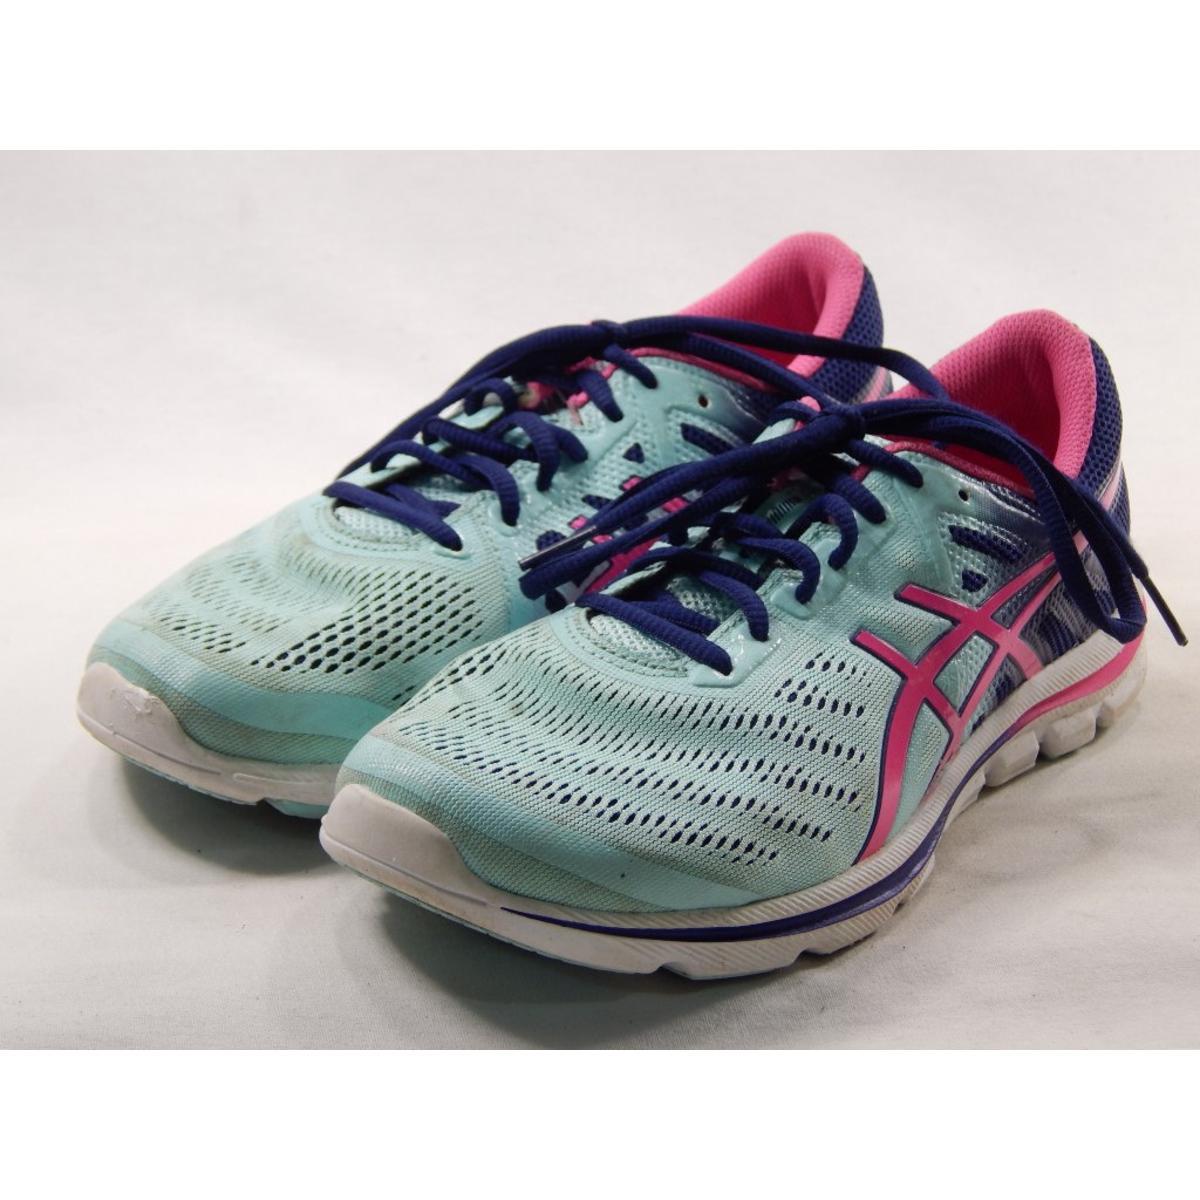 Chaussures de course marine à pied Gel bleu ASICS Gel Electro33 pour femme, bleu glacier/ rose vif/ bleu marine 5c71f95 - welovebooks.website